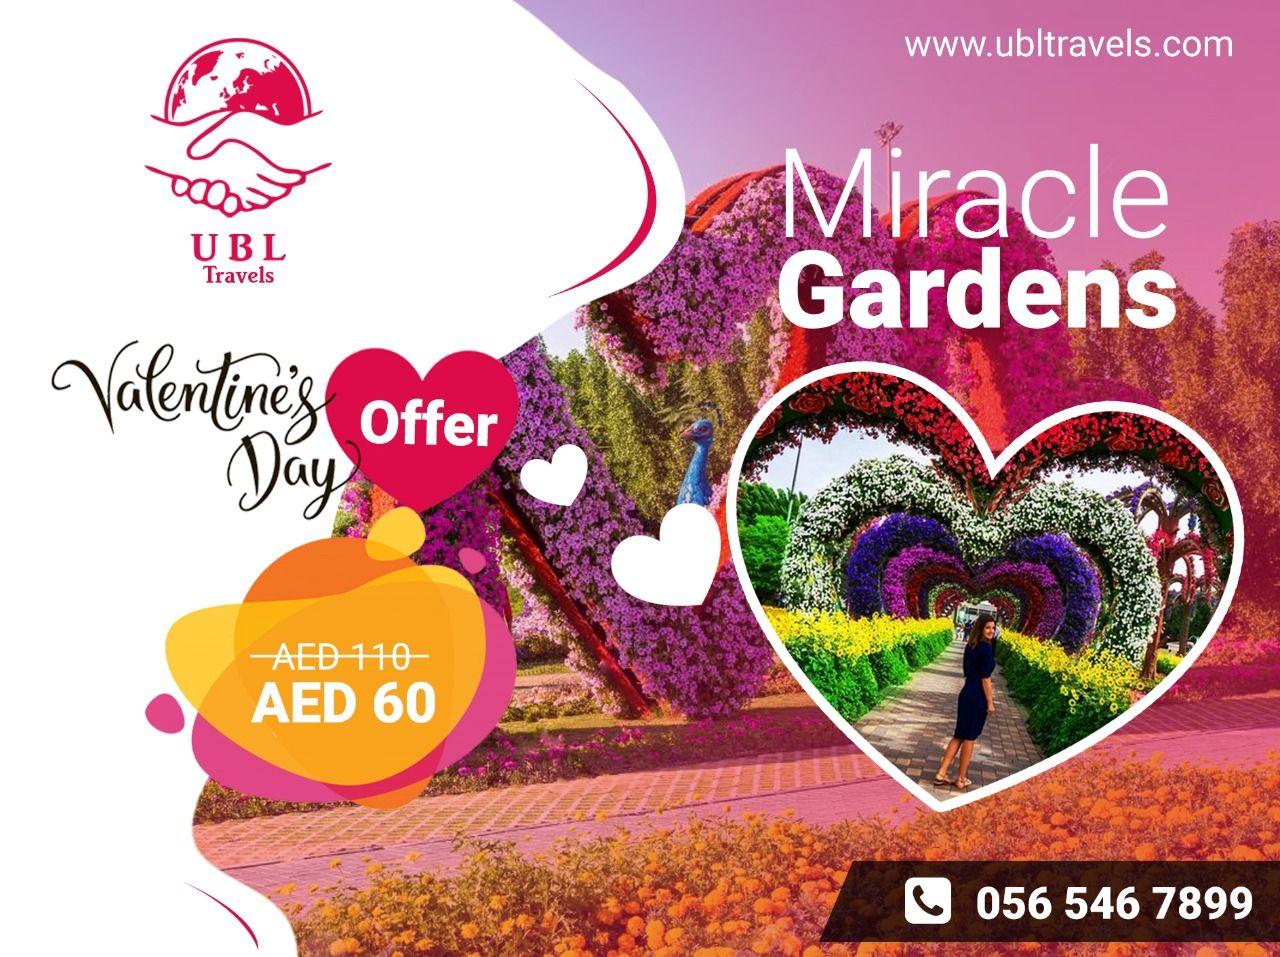 Miracle Garden in 2020 Miracle garden, Dubai tourism